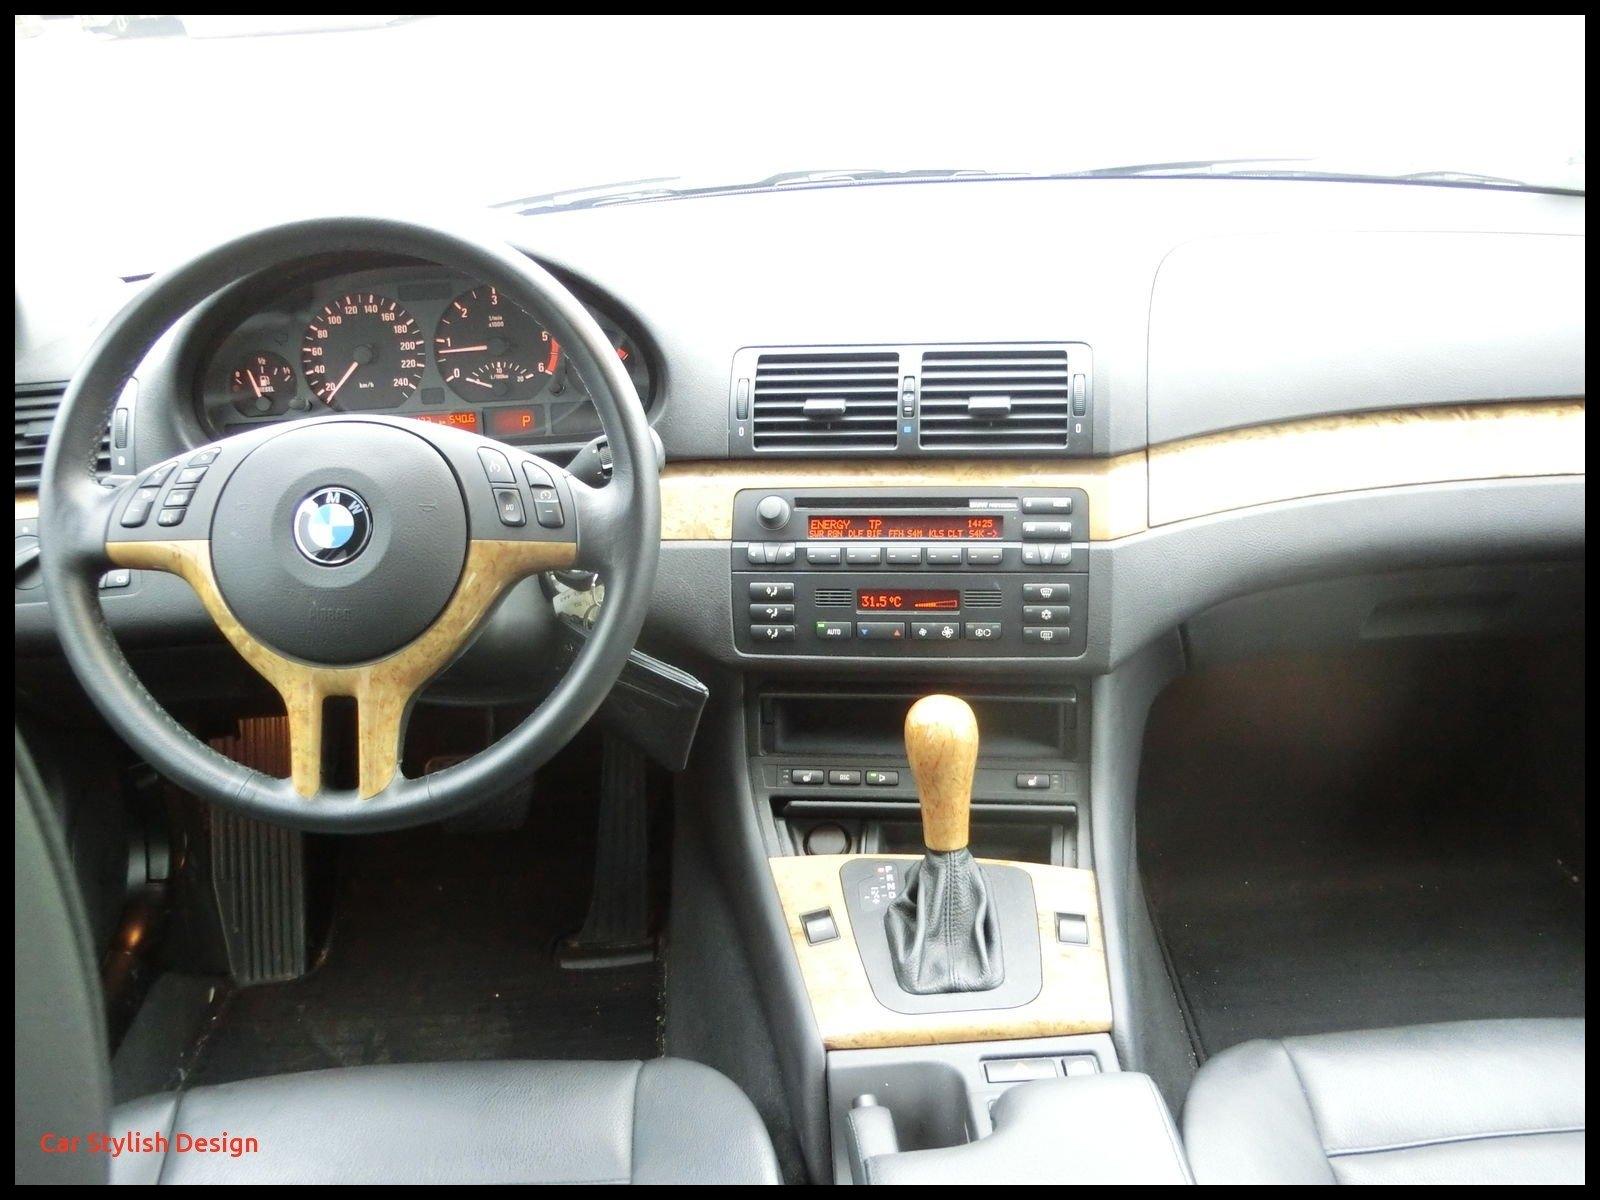 2001 Bmw 325i Elegant Bmw E46 3er 01 05 2 0d D 110kw Autom Shift Gate